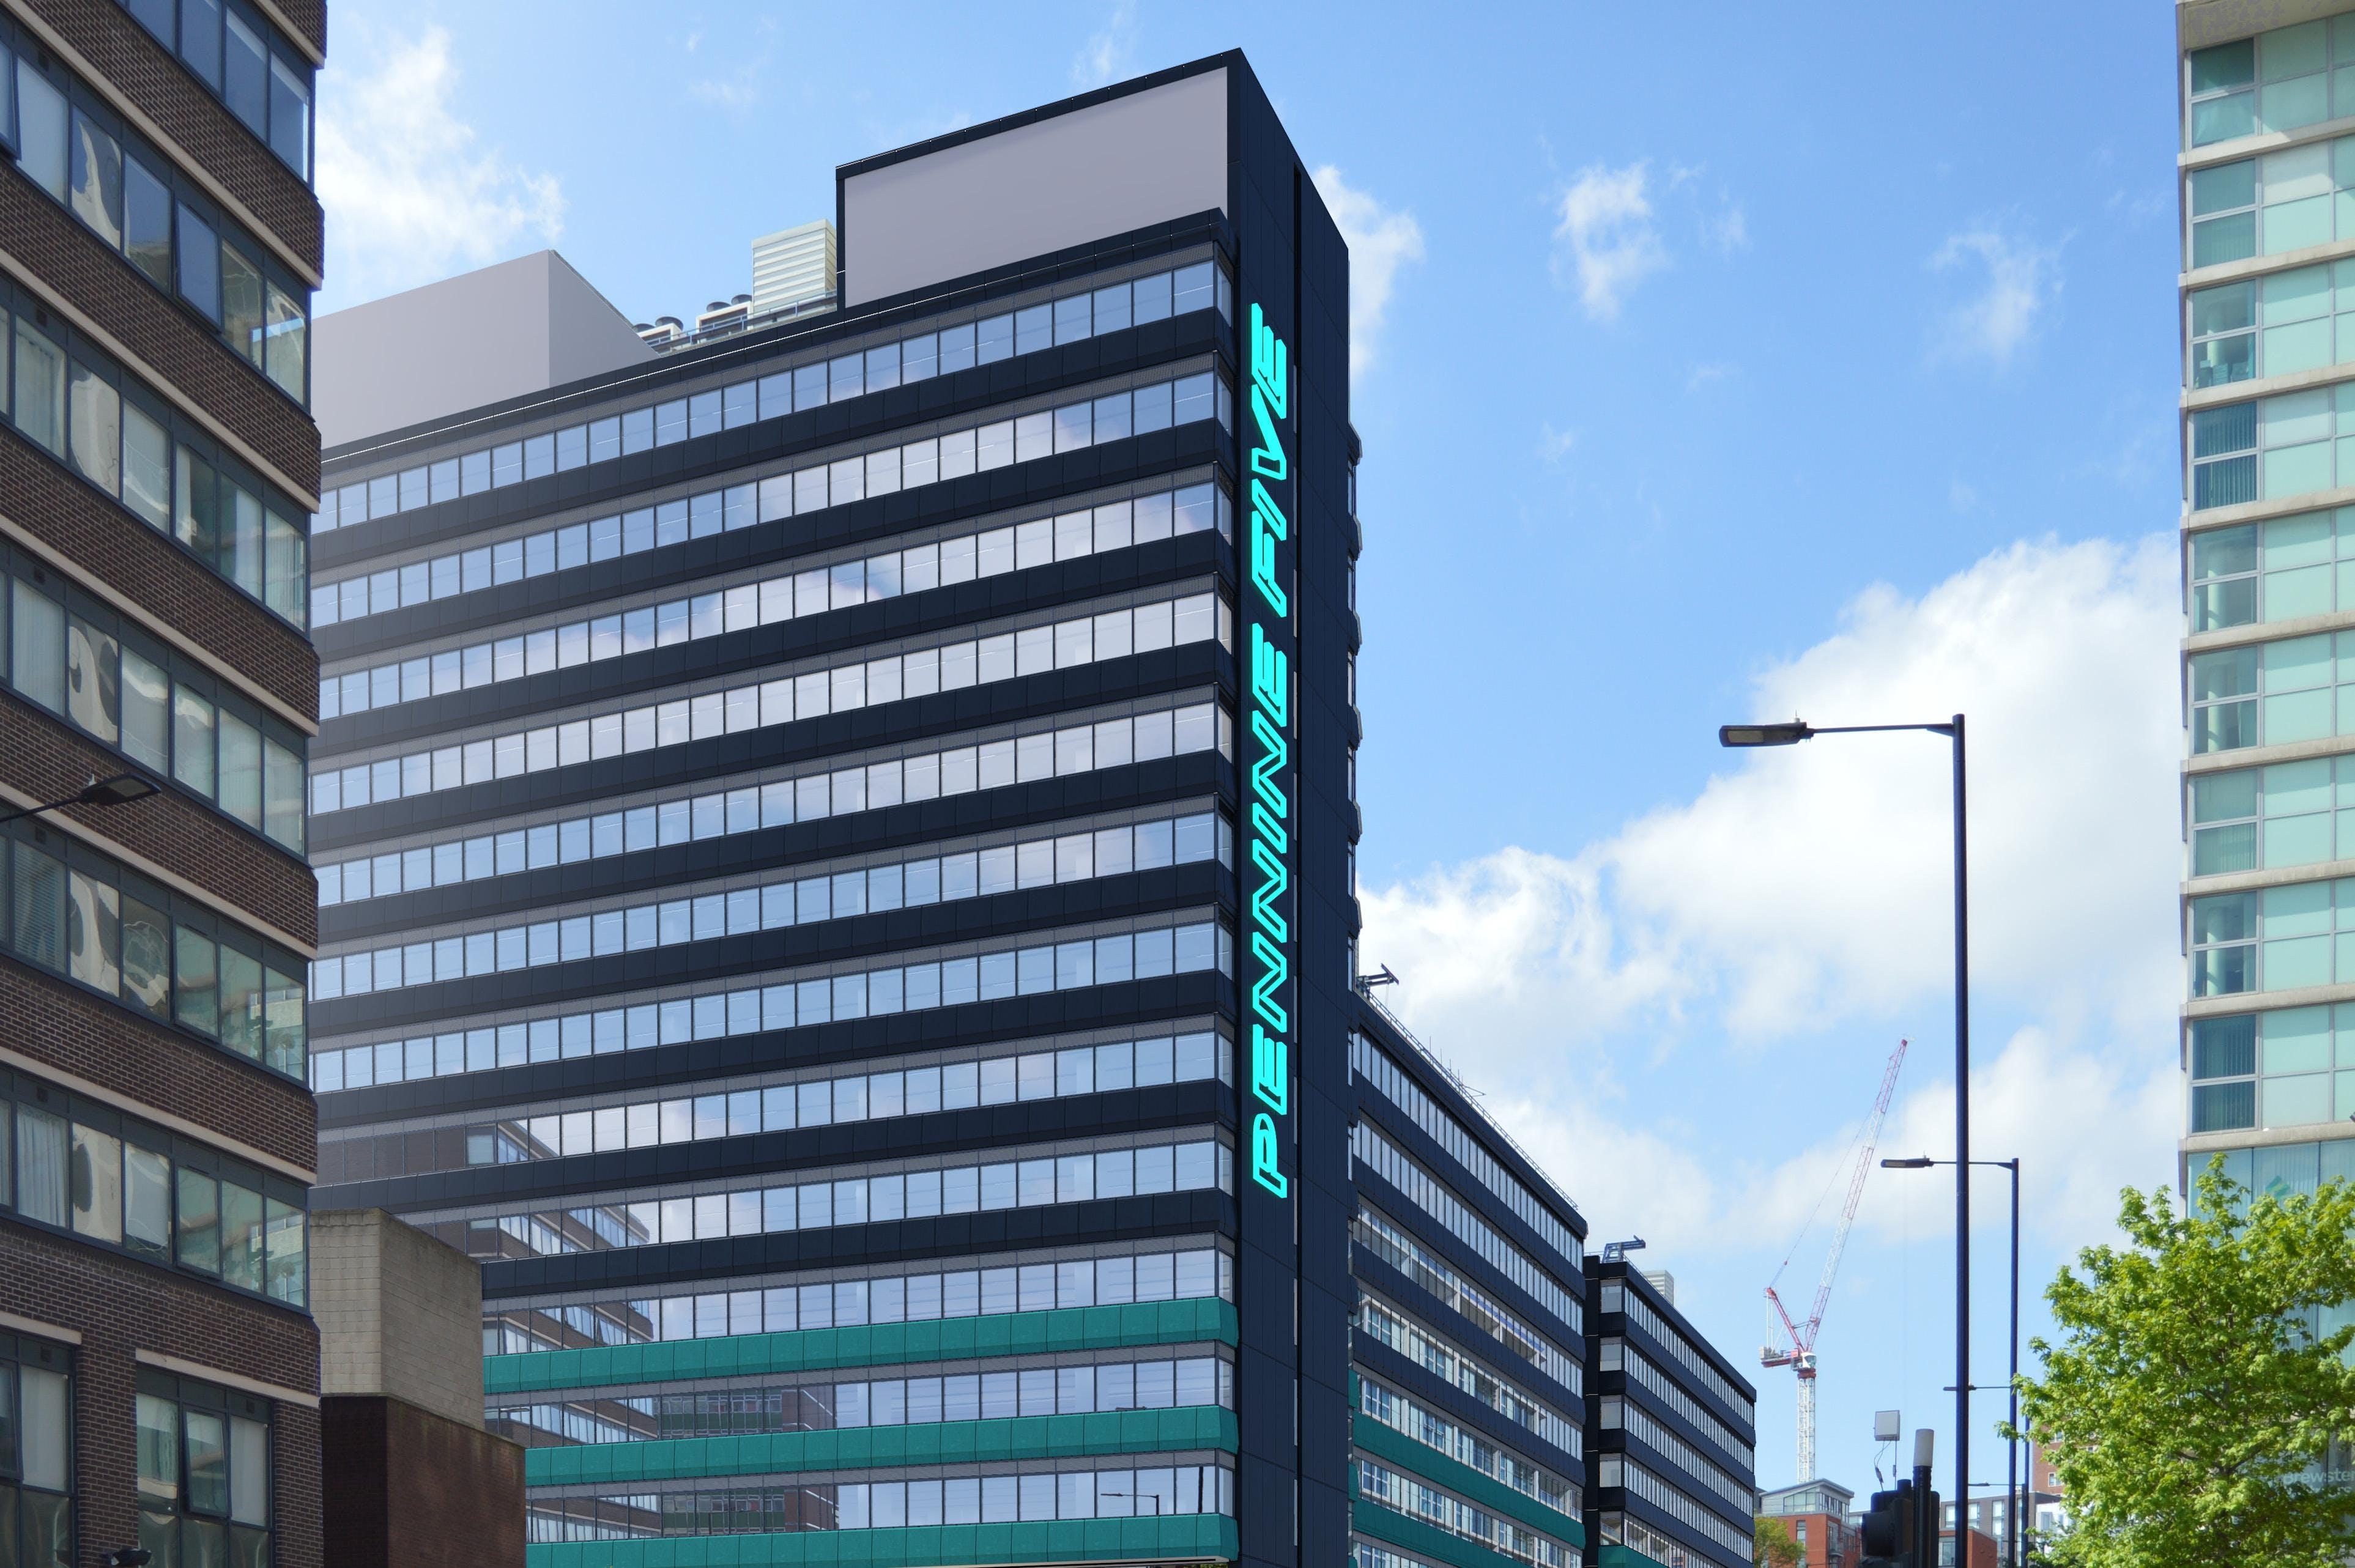 Pennine Five, Tenter Street, Sheffield, Offices To Let - P5 - Street Image 1.jpg